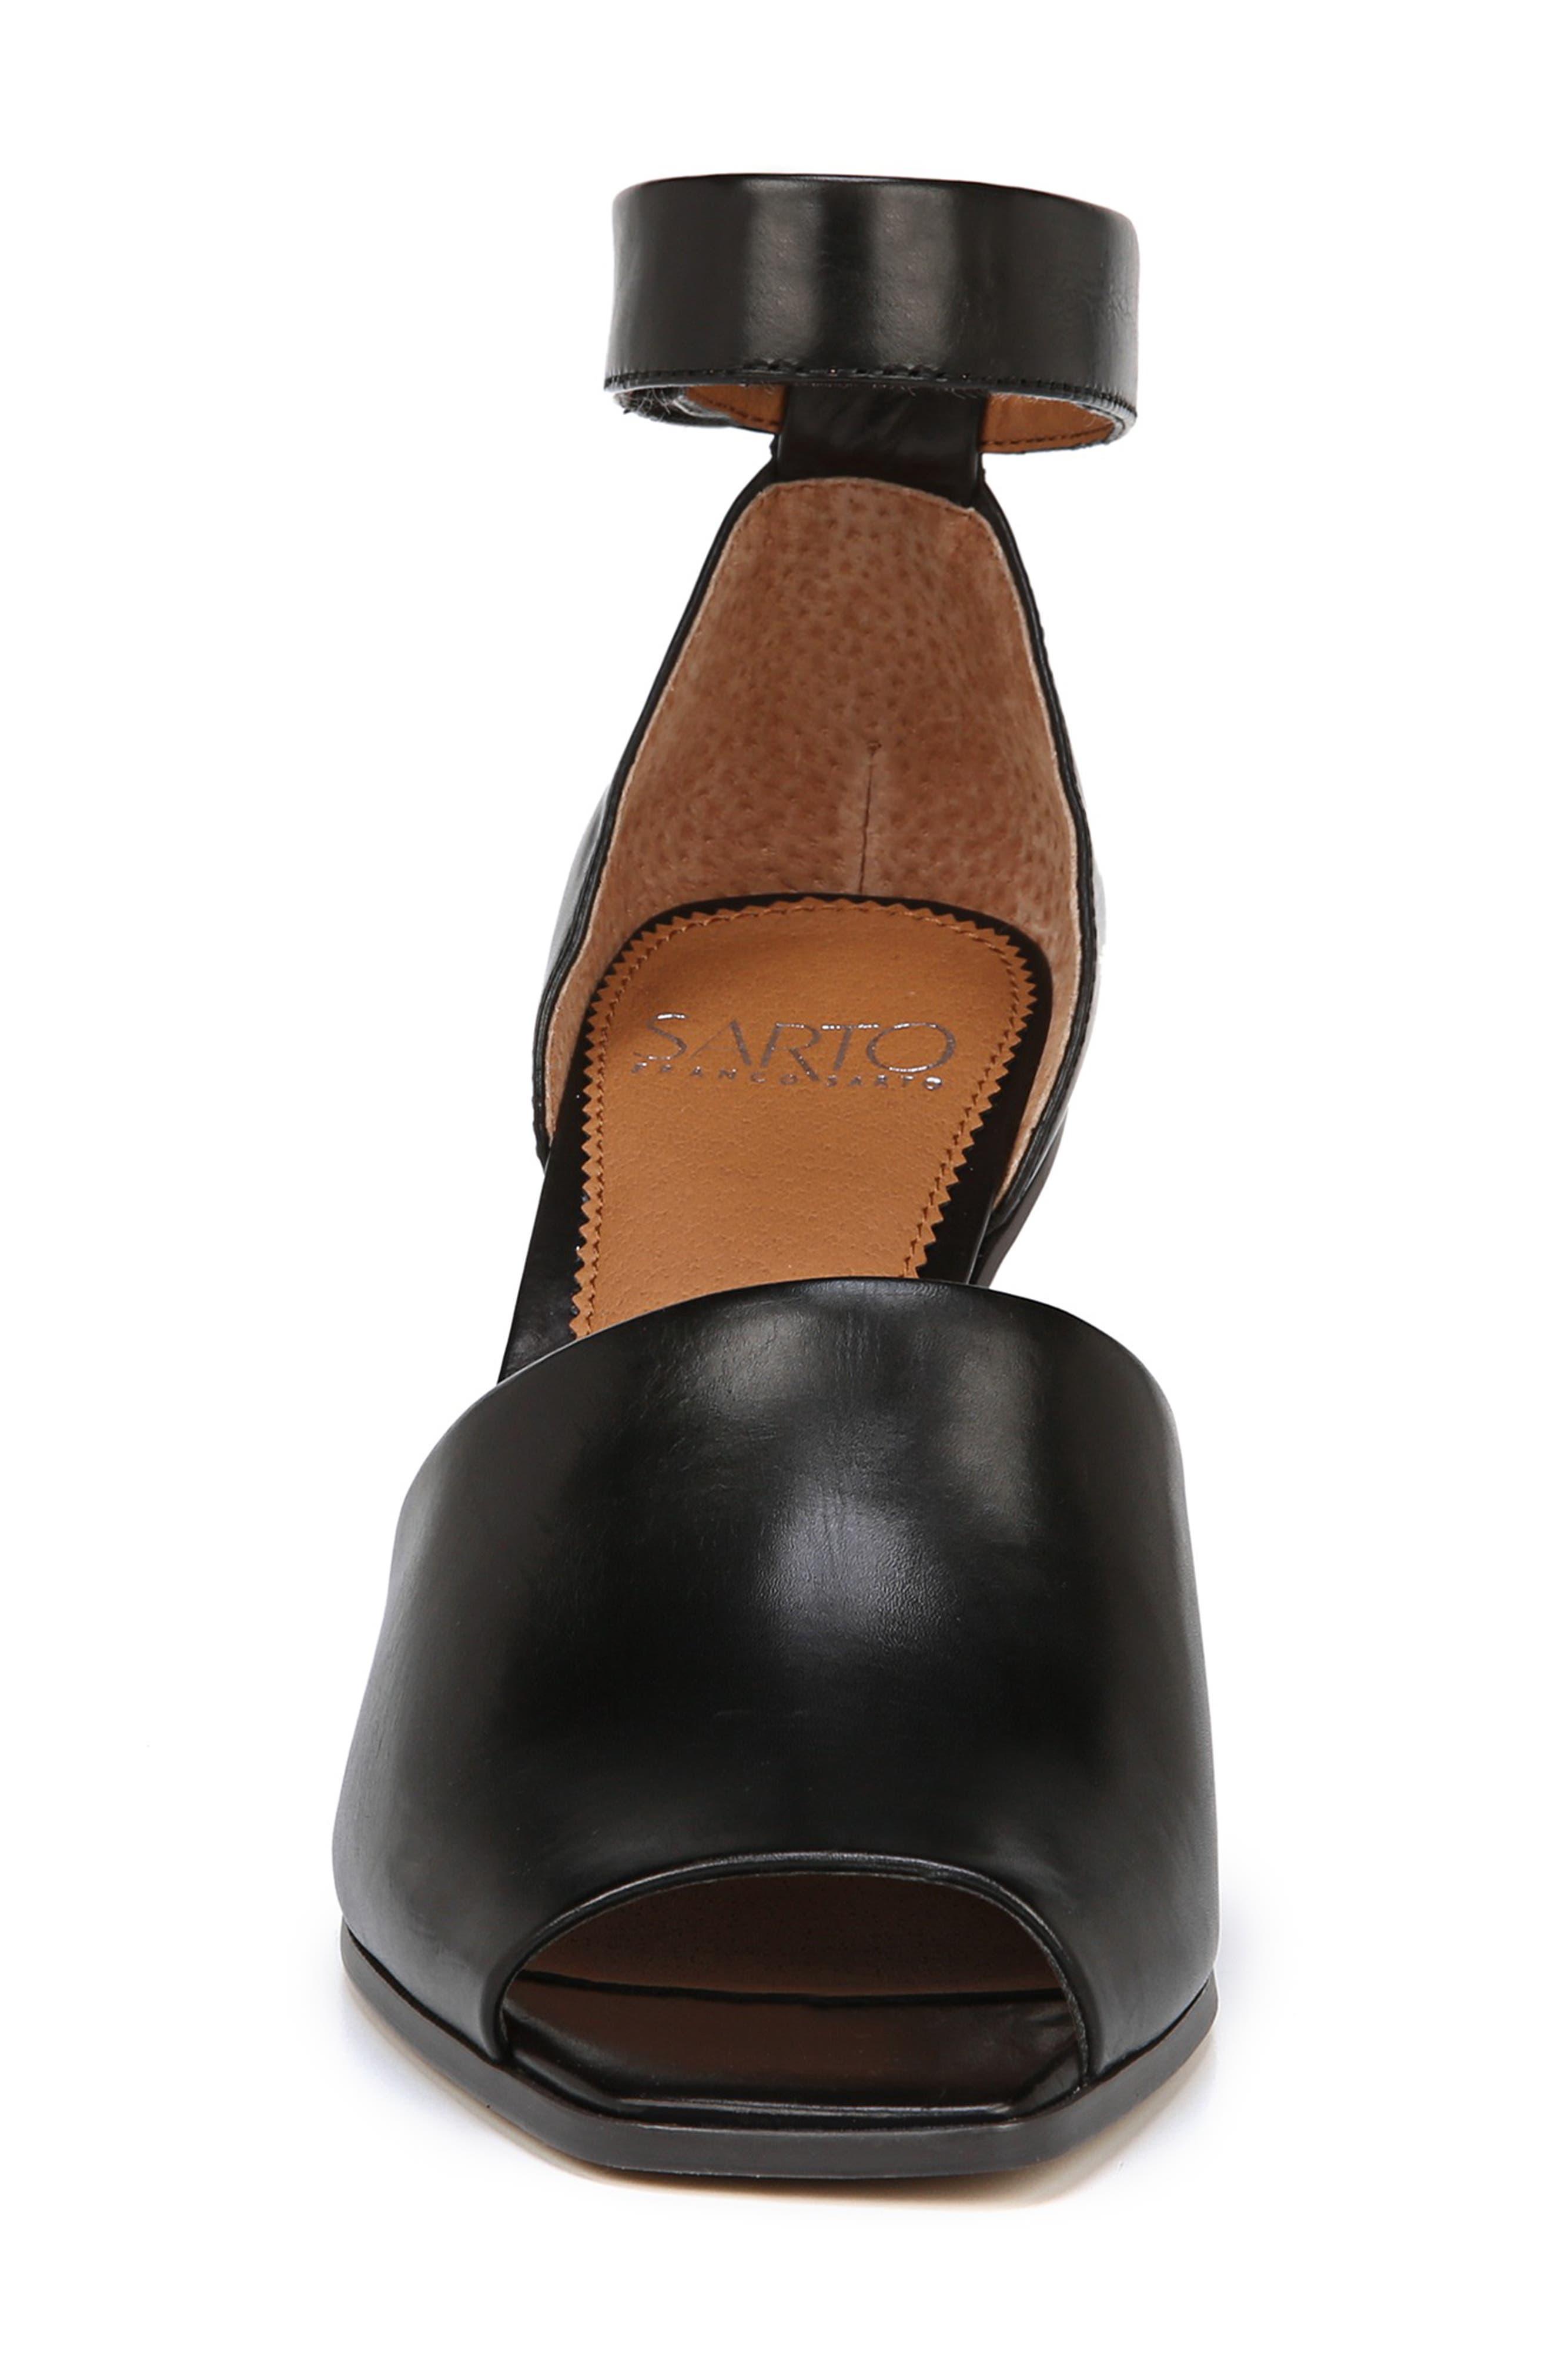 SARTO BY FRANCO SARTO, Ankle Strap Sandal, Alternate thumbnail 4, color, BLACK FOULARD LEATHER